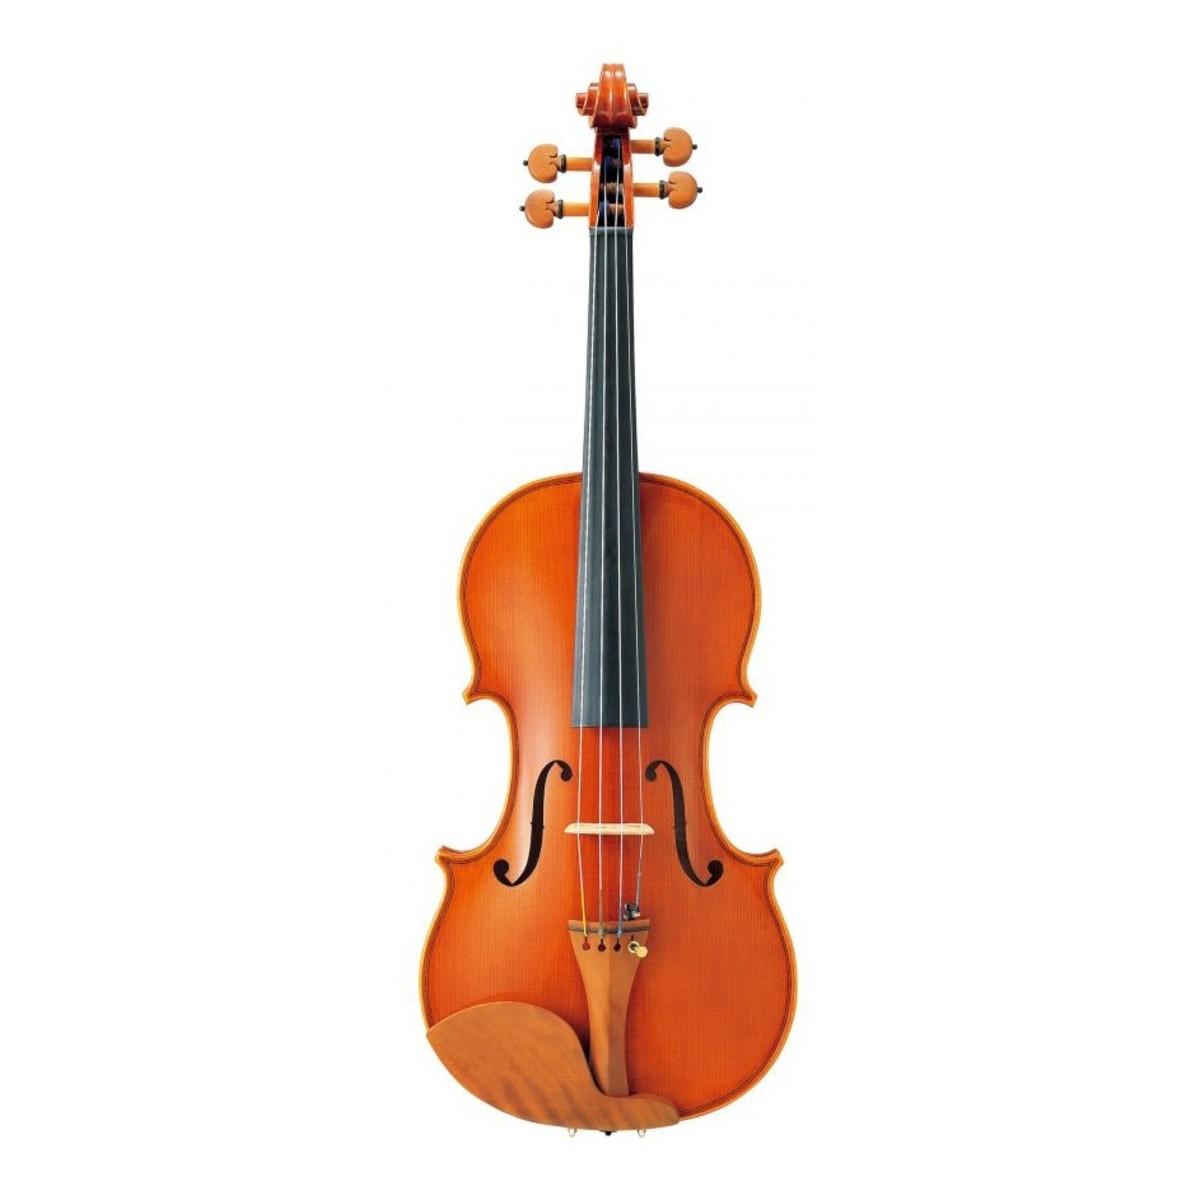 Yamaha yvn50 professional violin 4 4 instrument only at for Violin yamaha 4 4